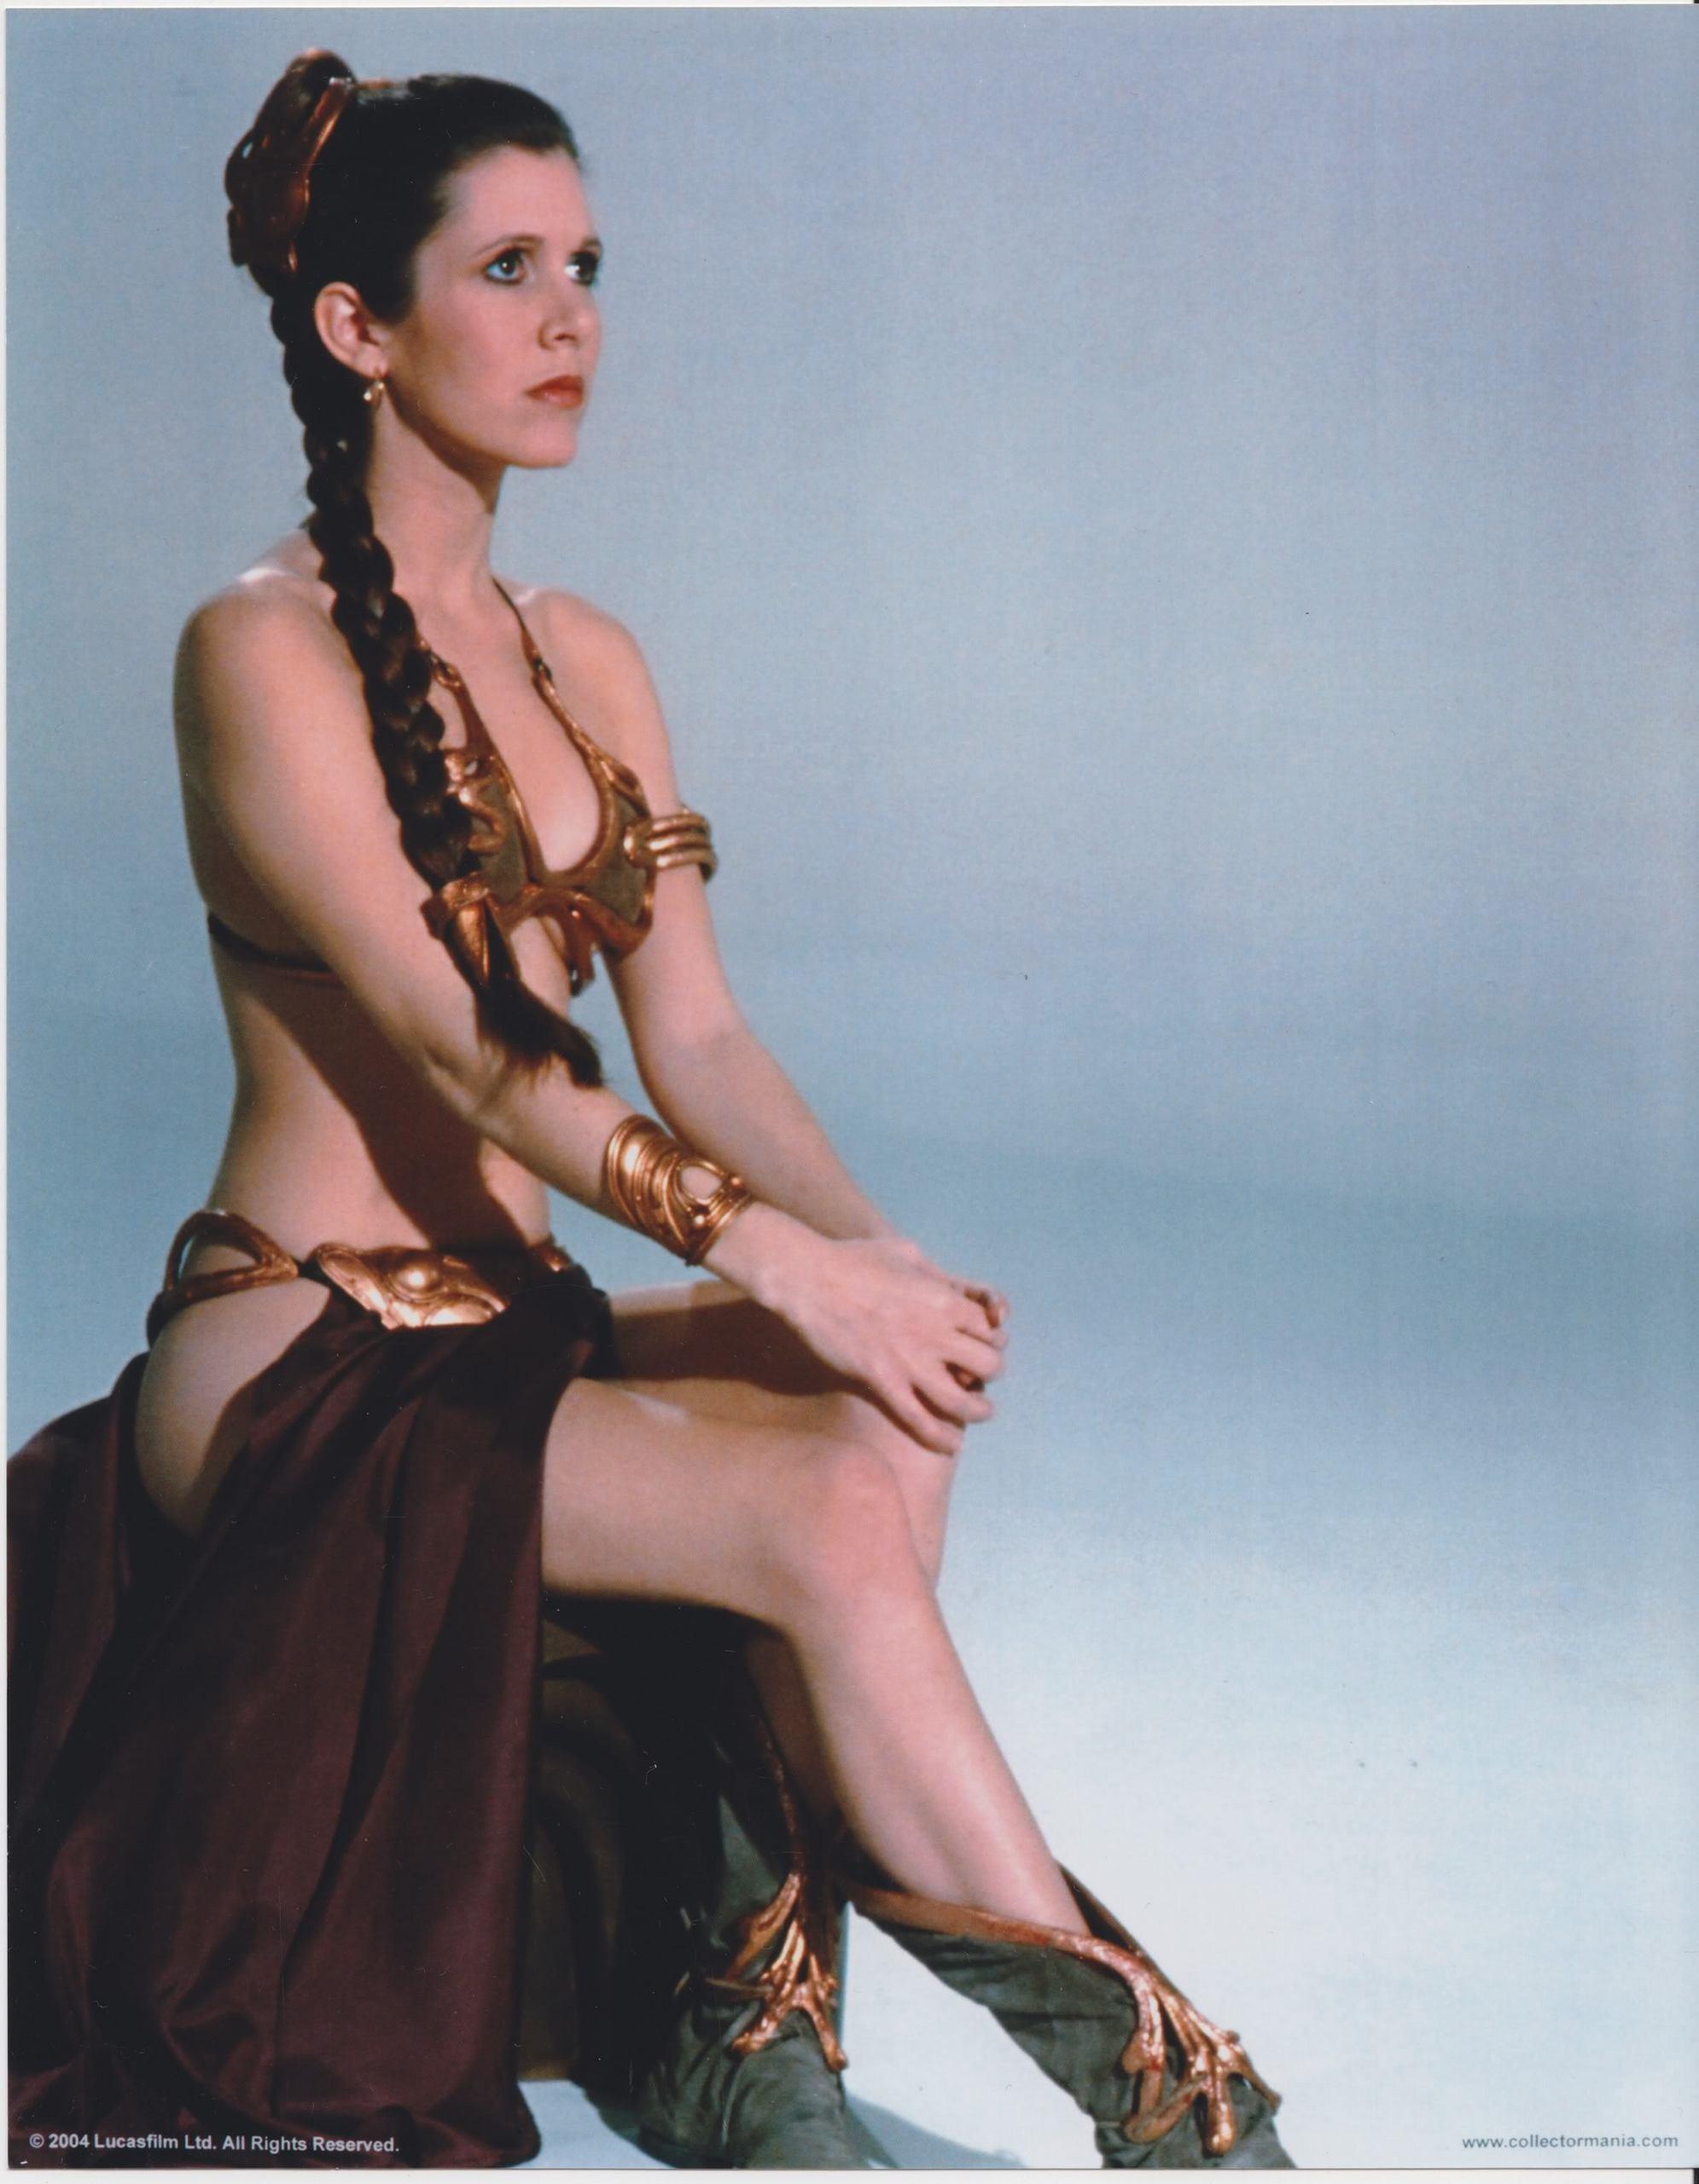 Newstar diana model nude